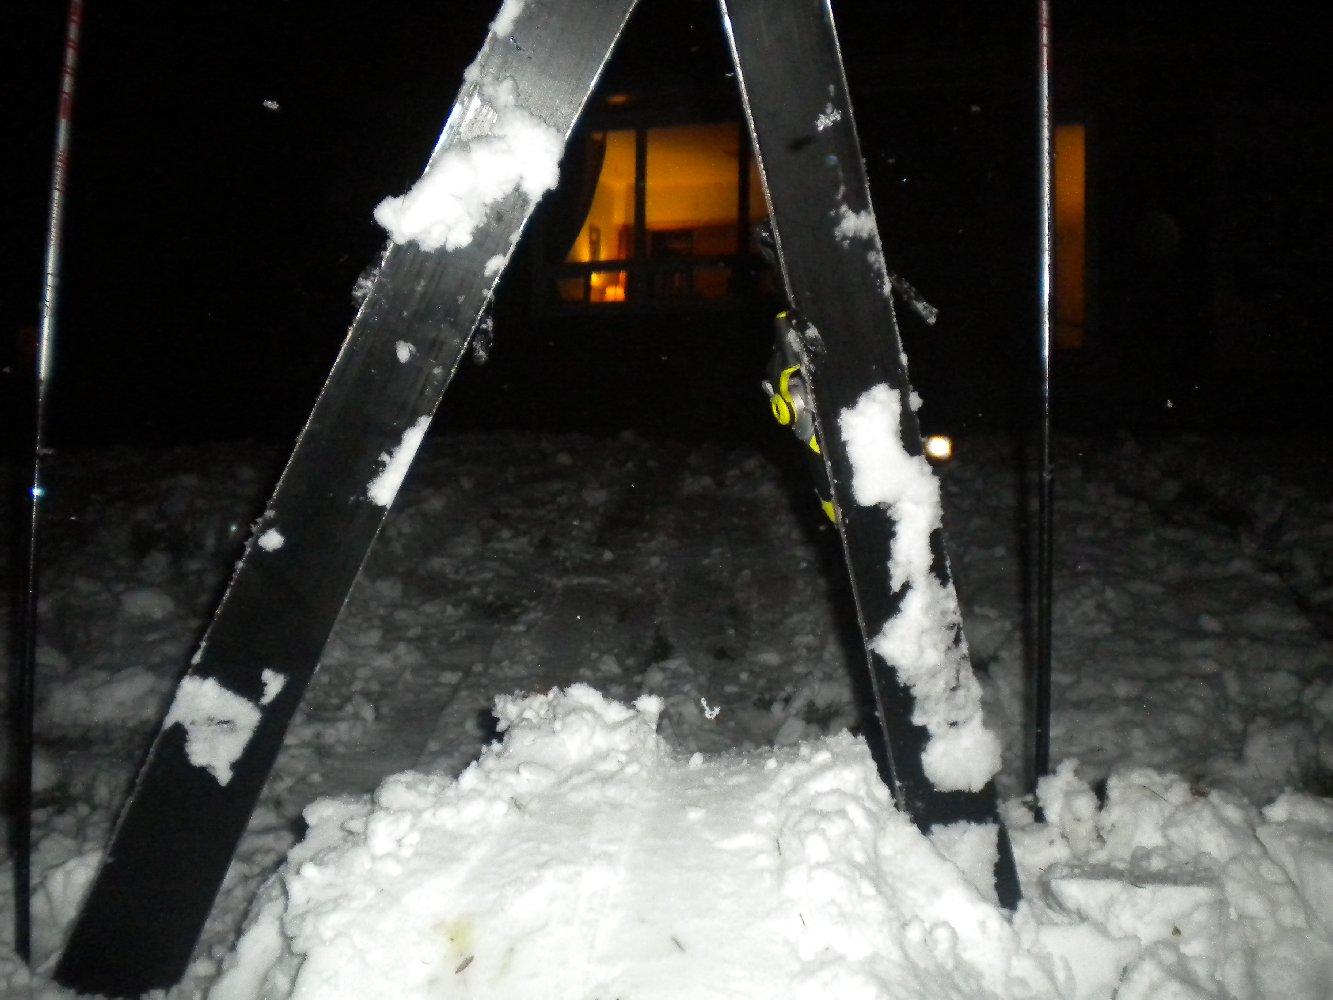 Backyard Skiing on April 18th - 1 of 27